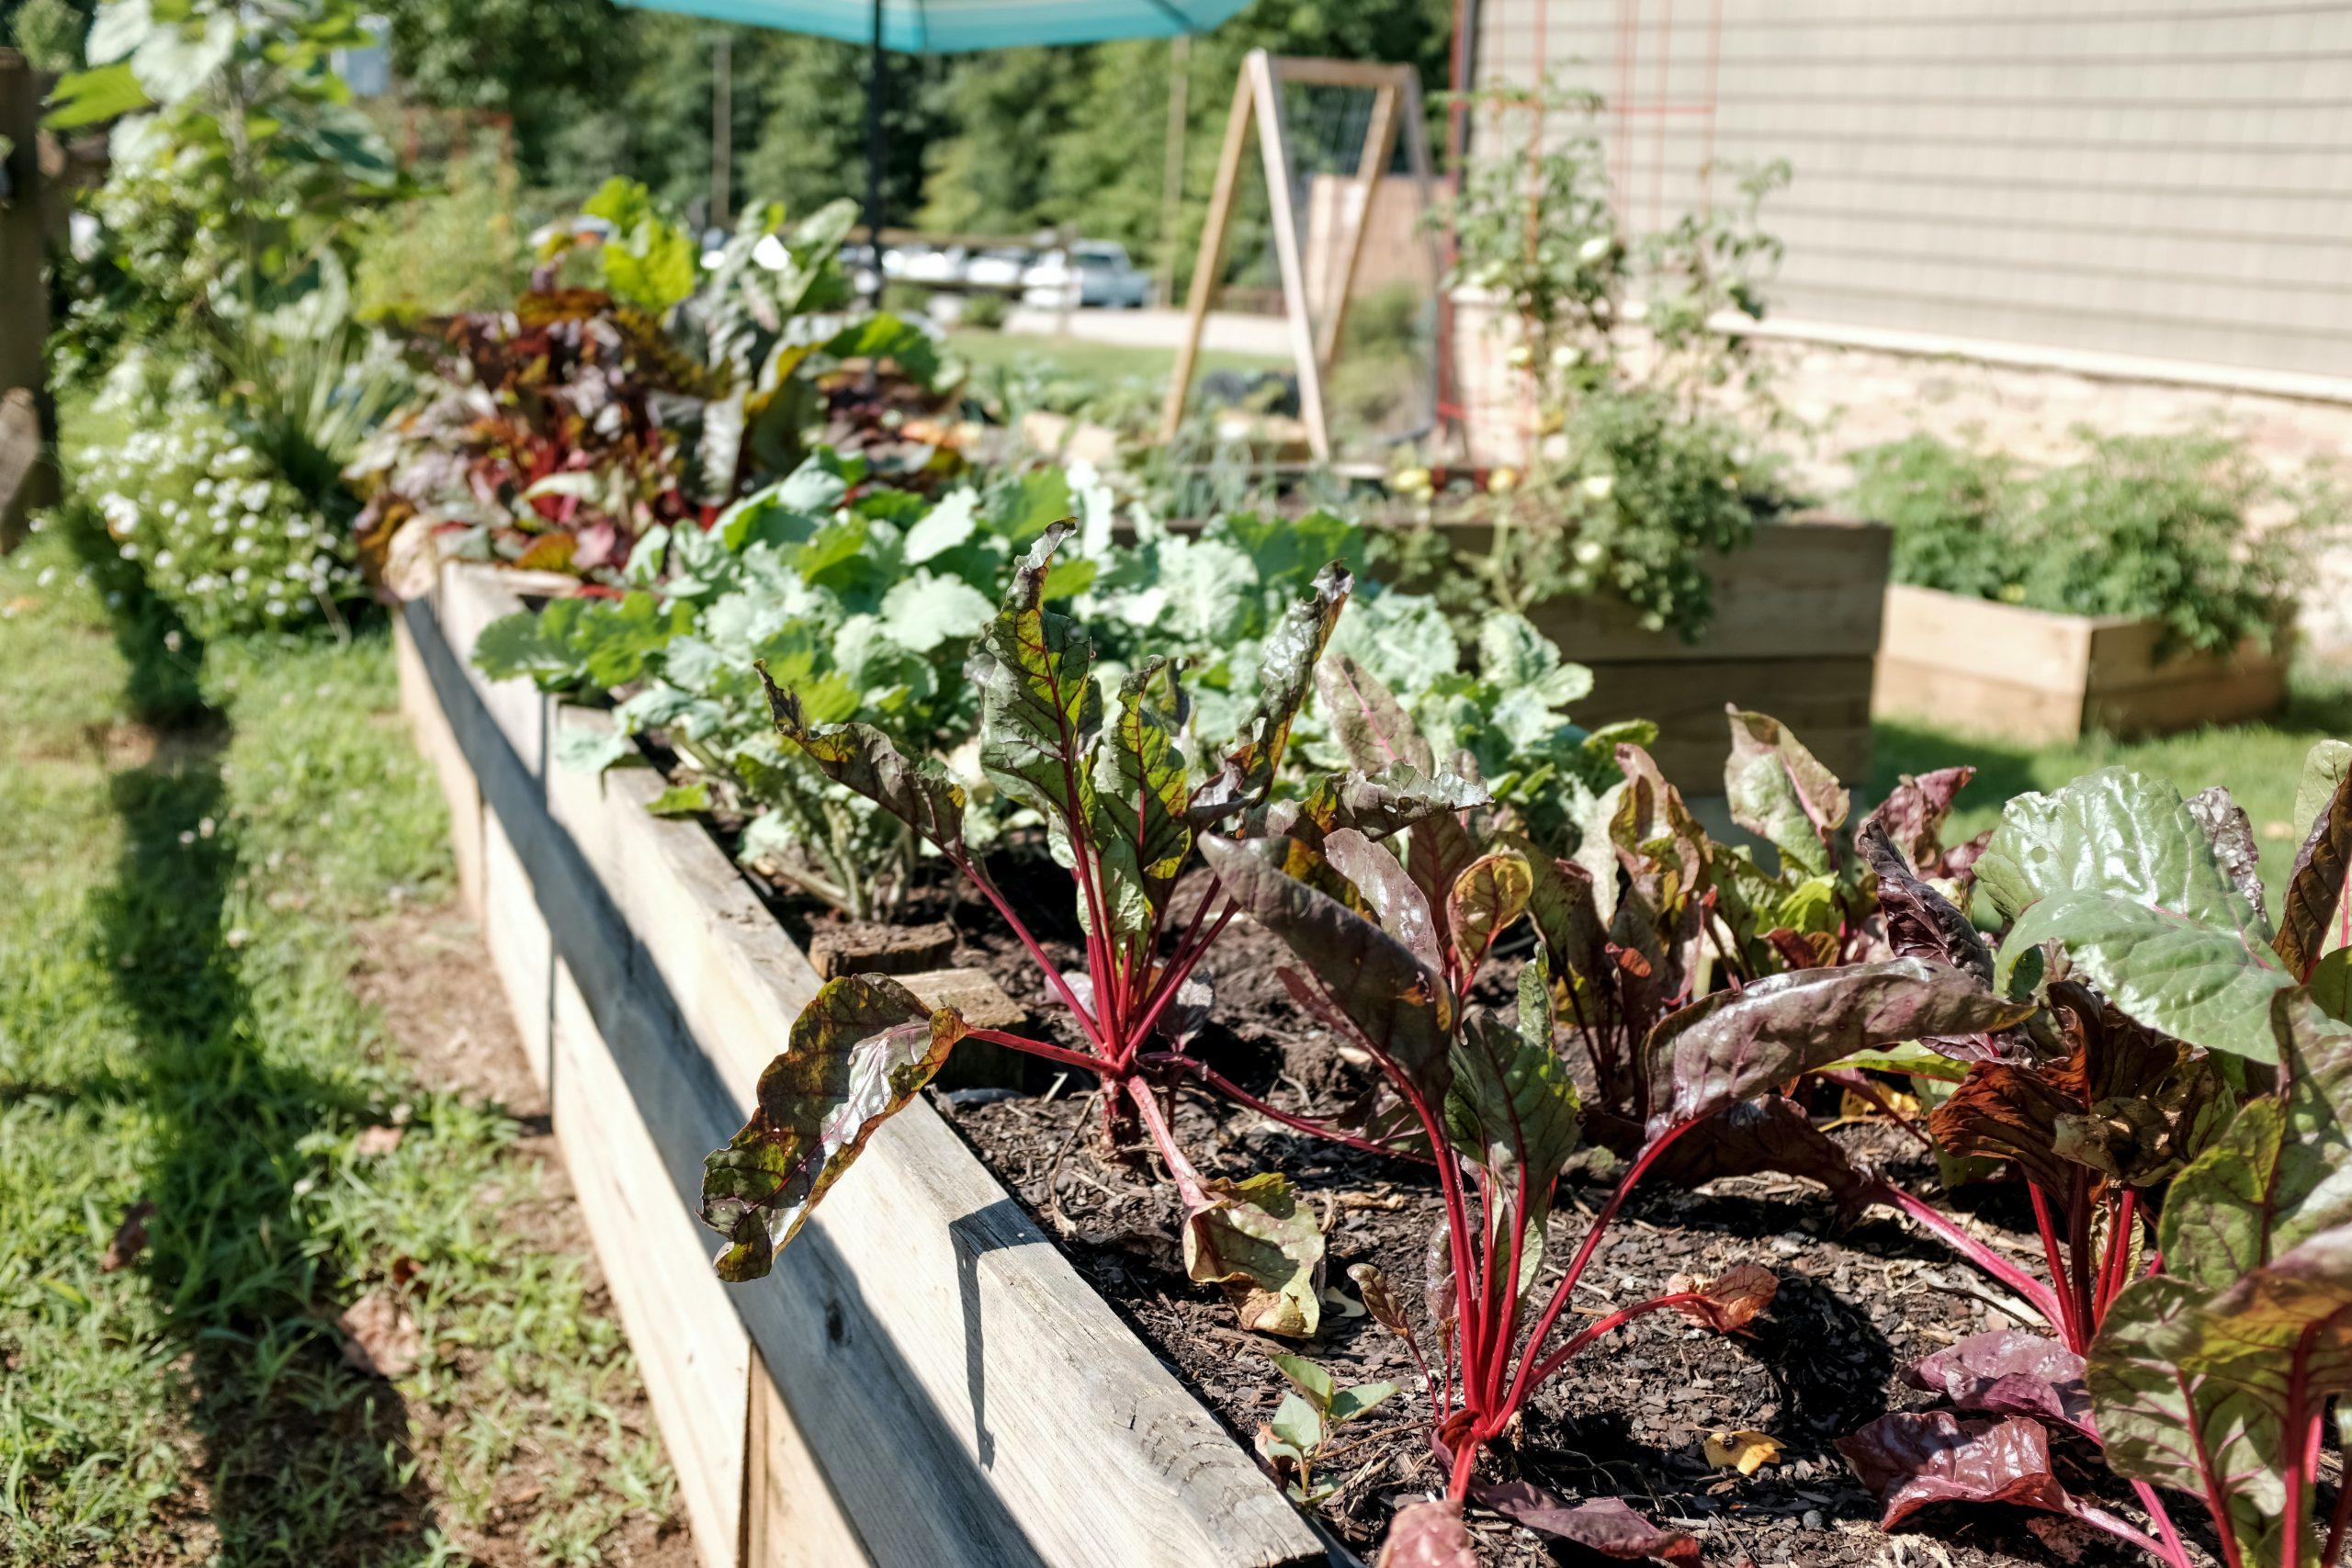 Home built vegetable patch in garden